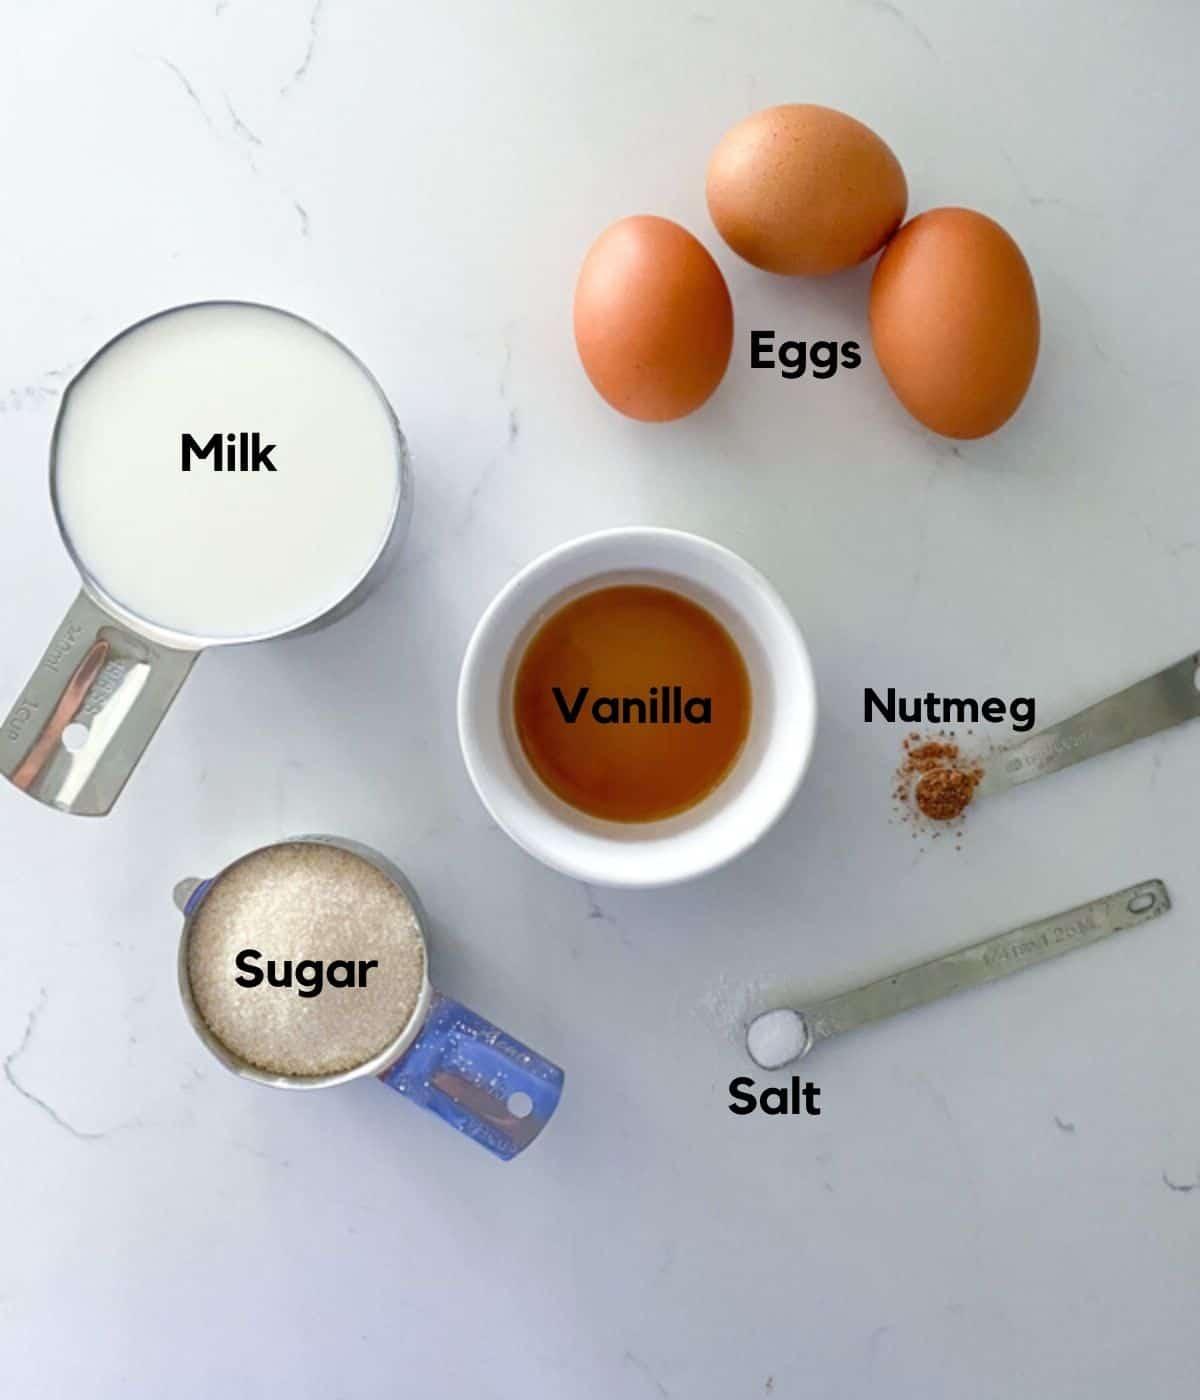 Egg custard tart ingredients on a table including vanilla, sugar, nutmeg, eggs, milk and salt.